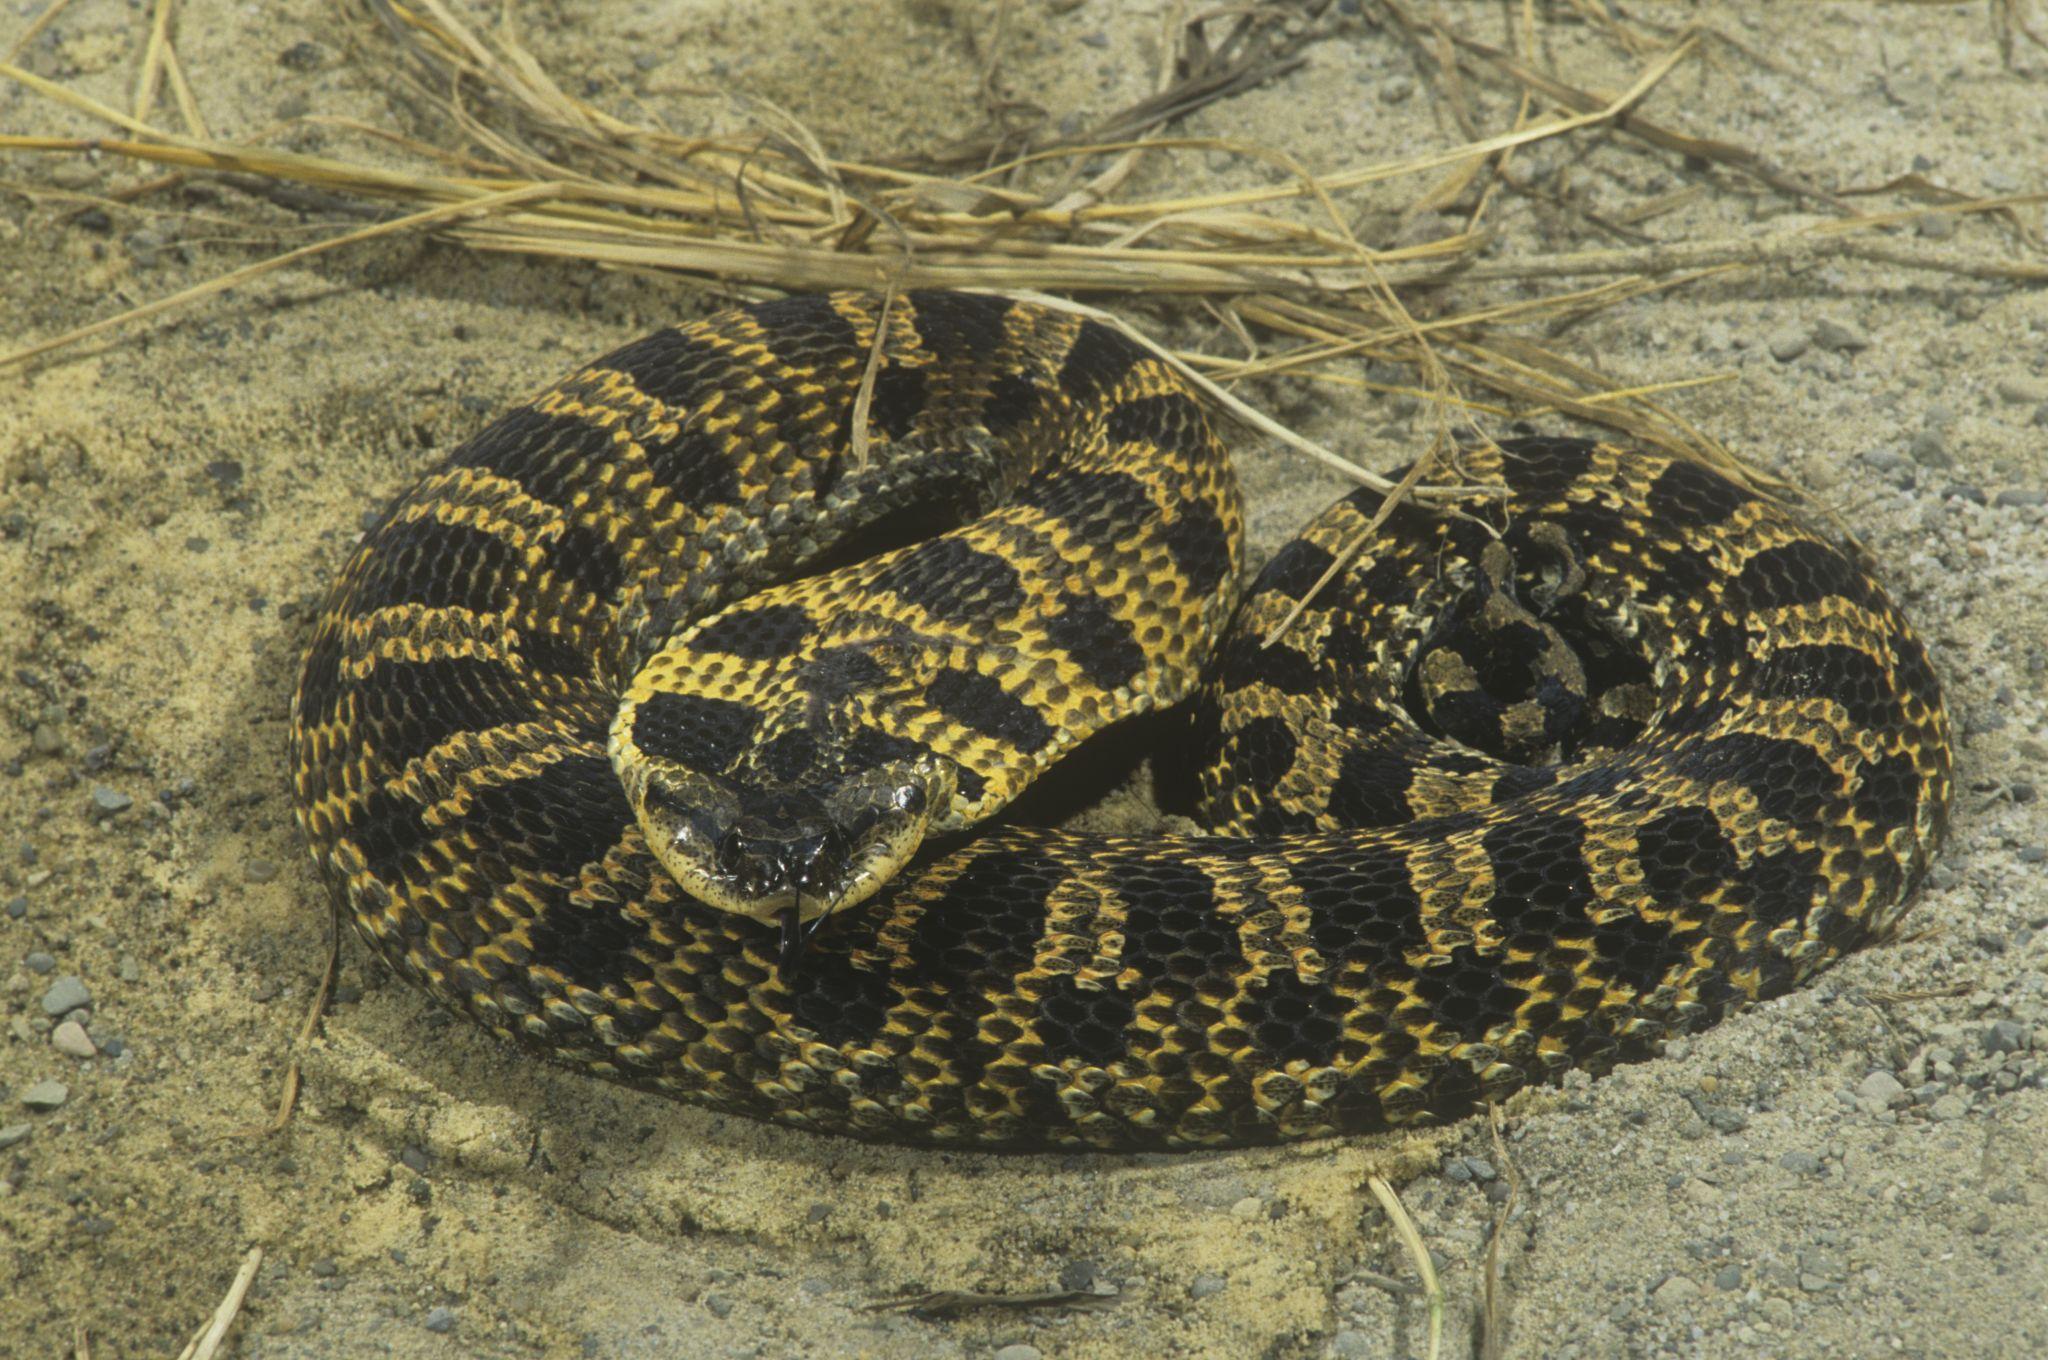 11 Non Venomous Snakes You Want In Your Backyard